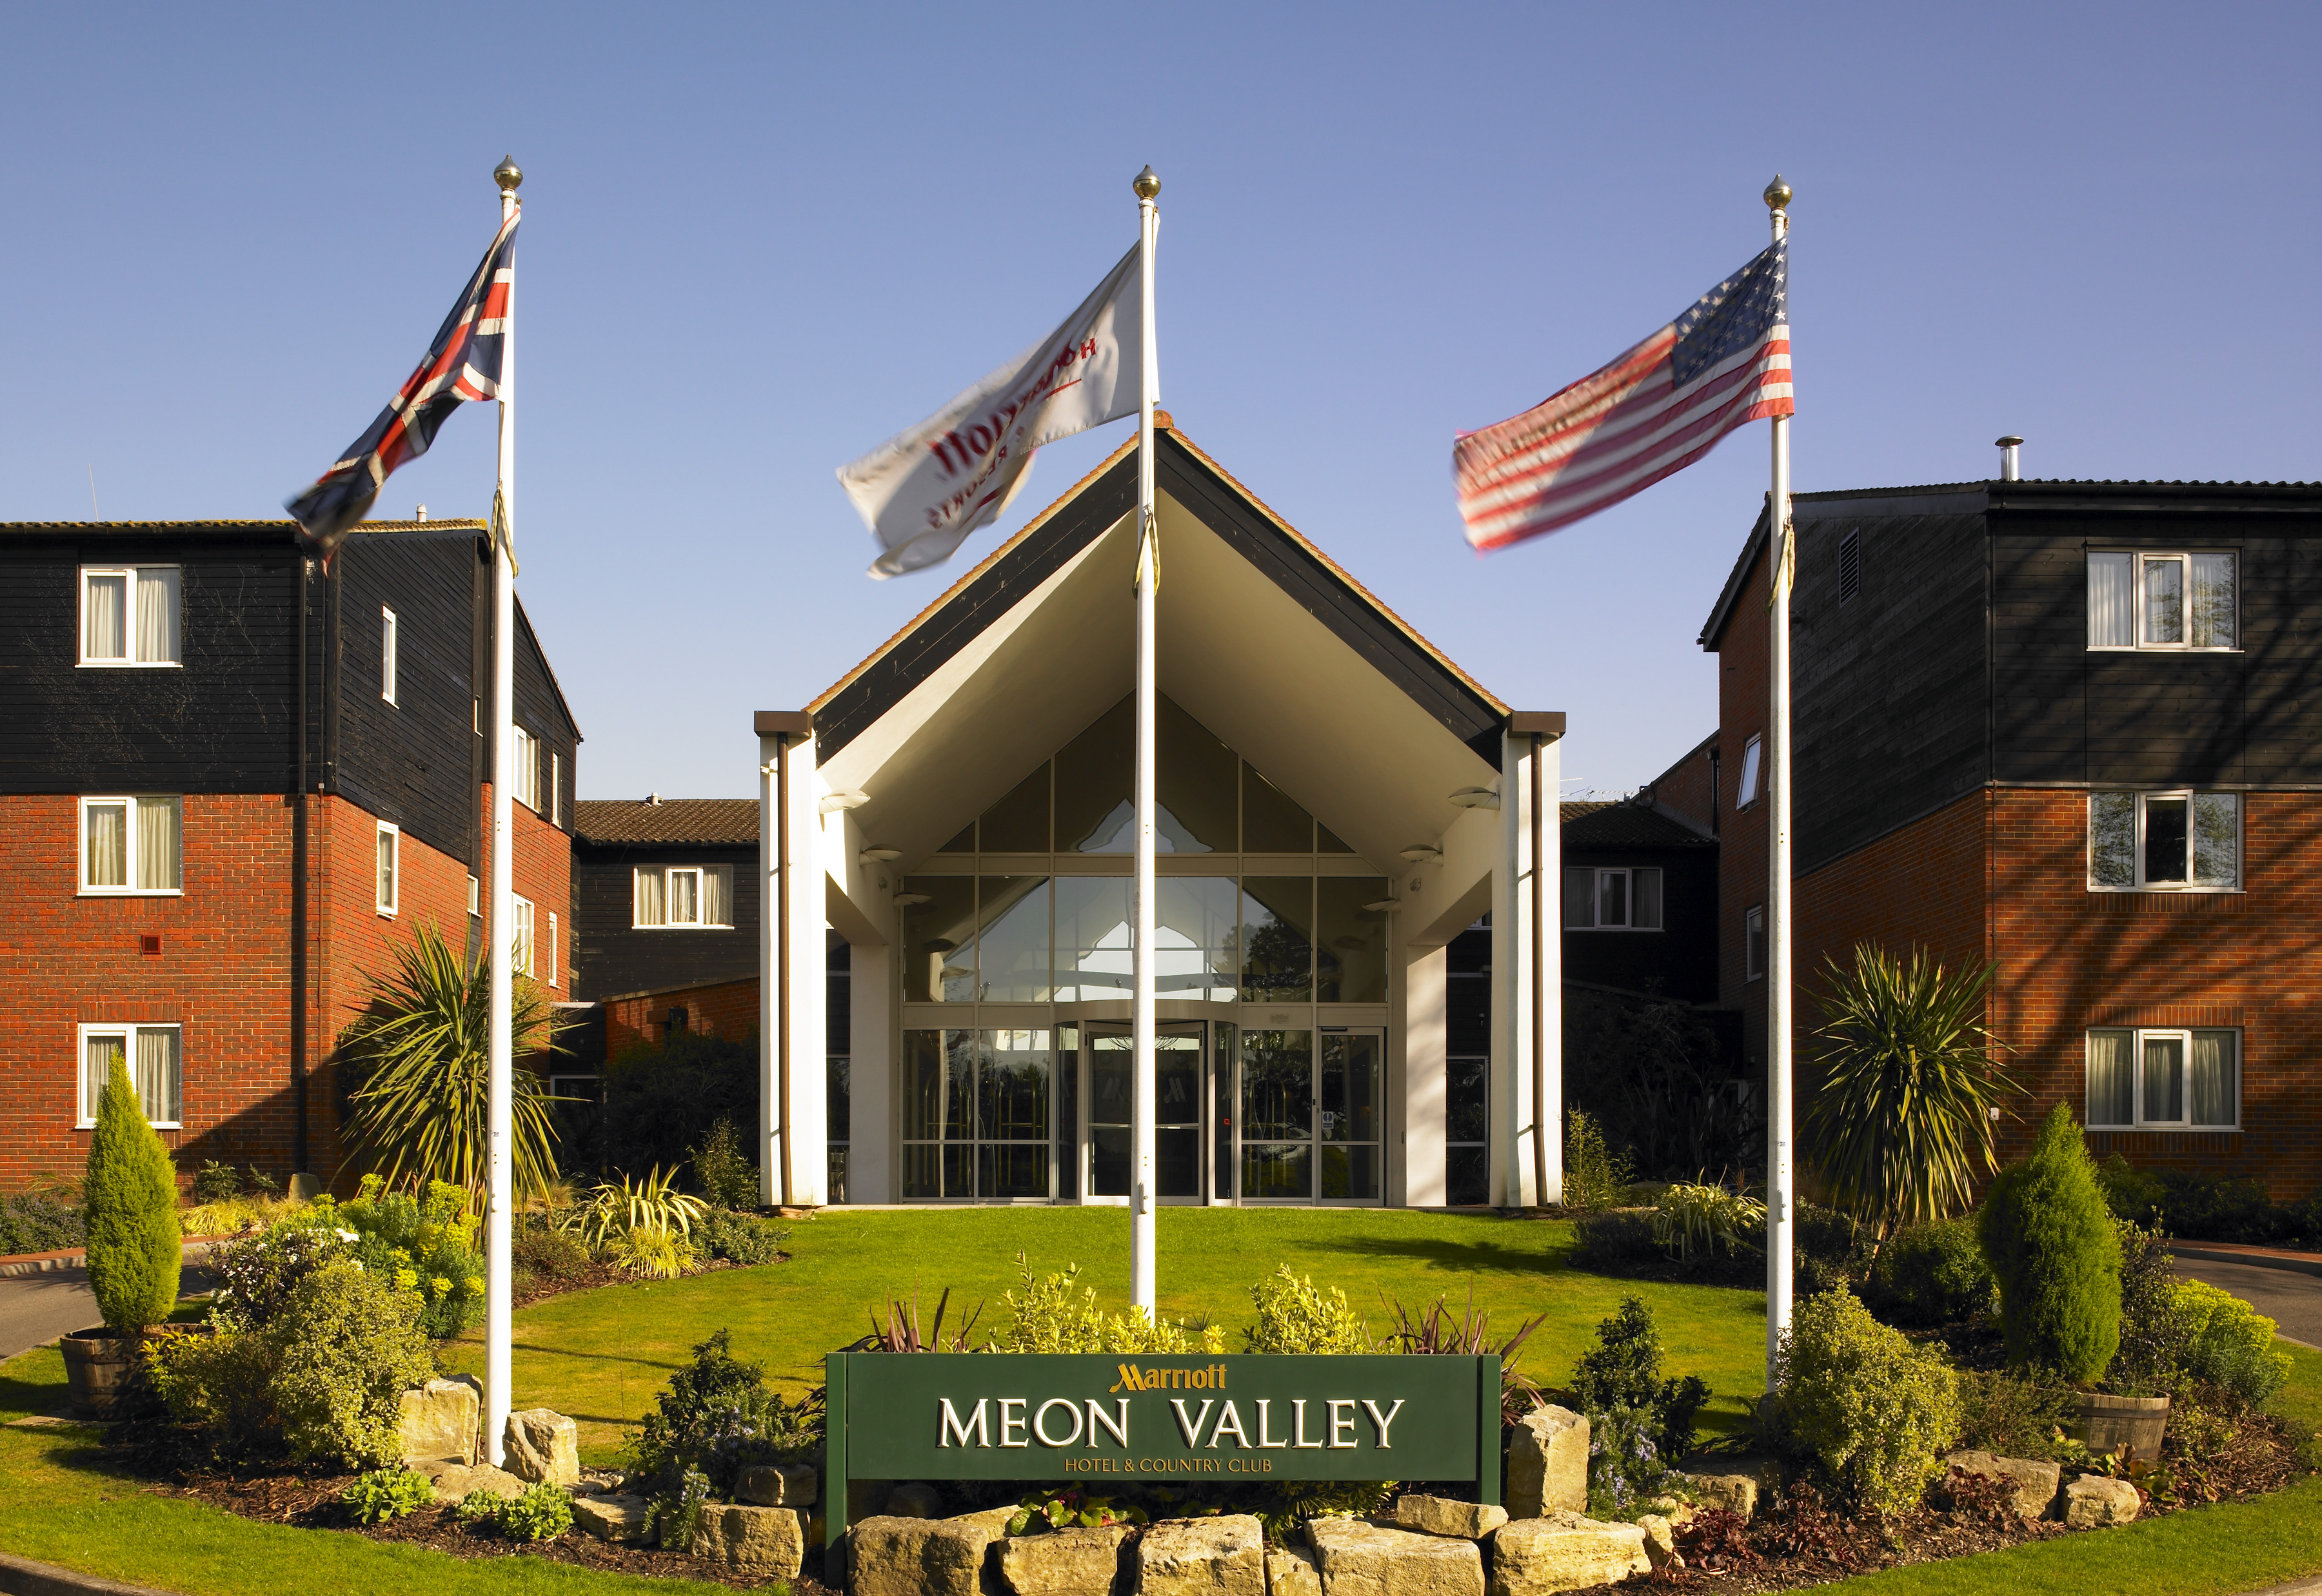 Meon valley entrance